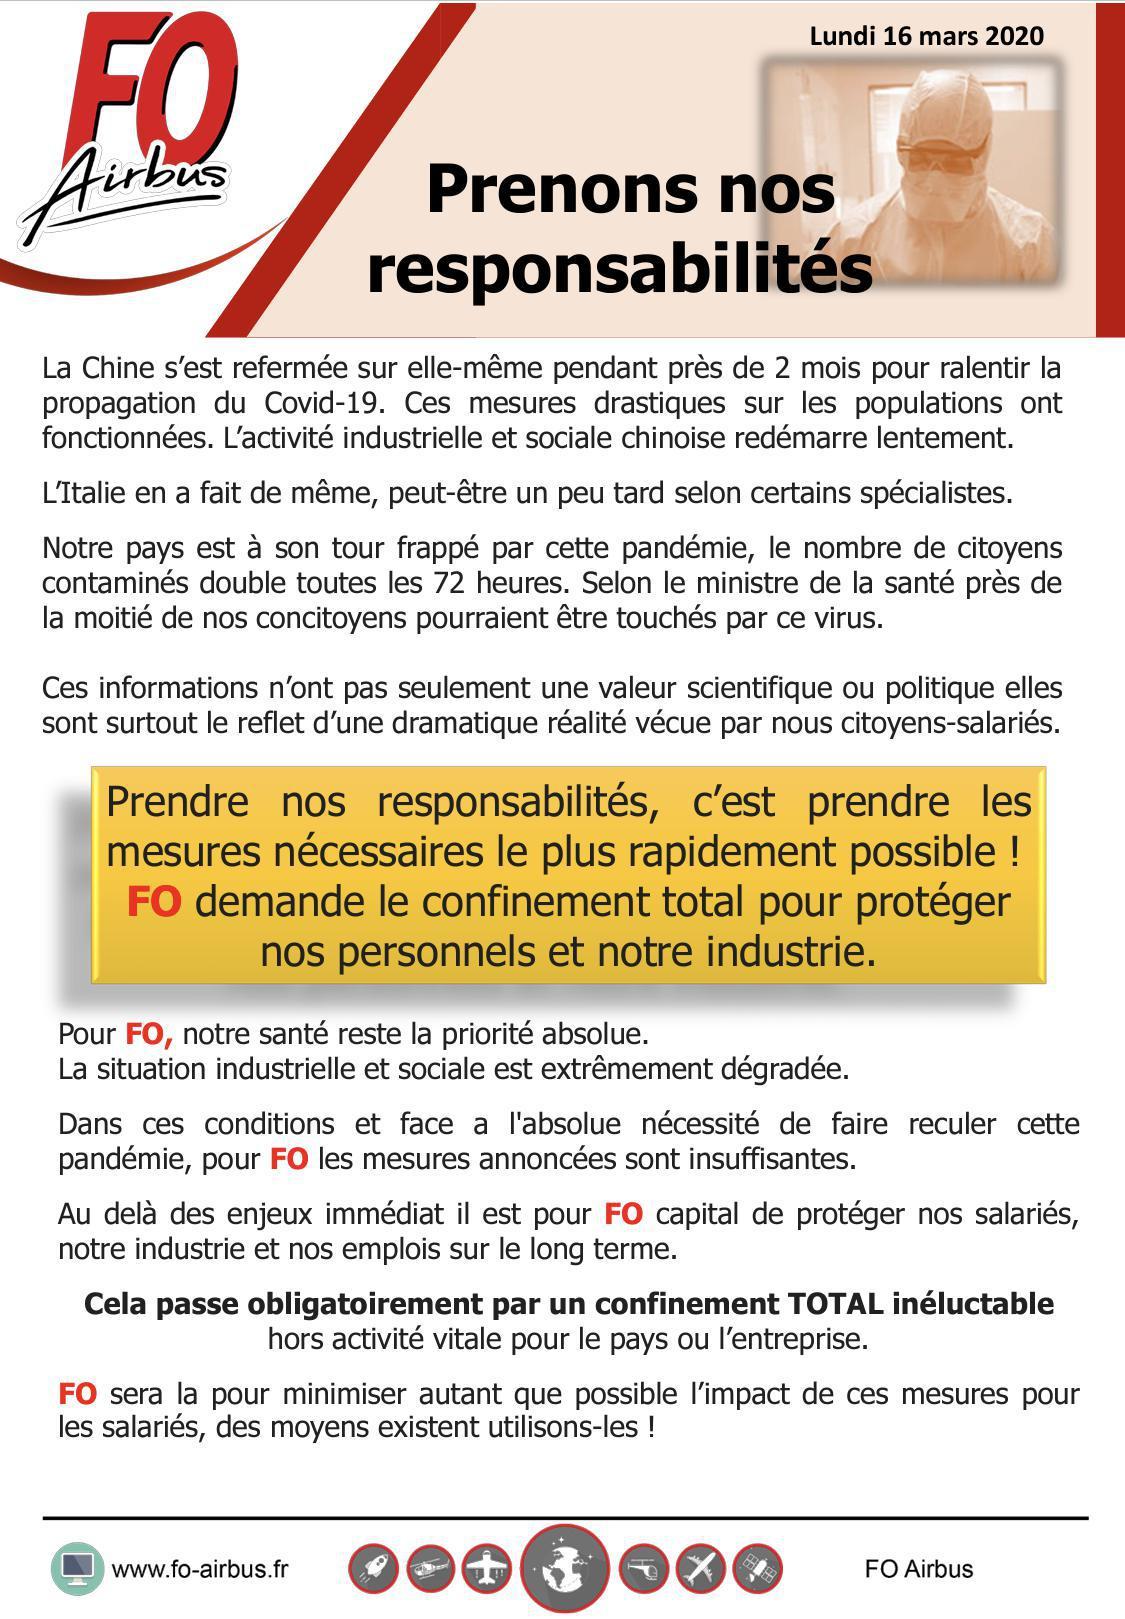 Coronavirus: Prenons nos responsabilités